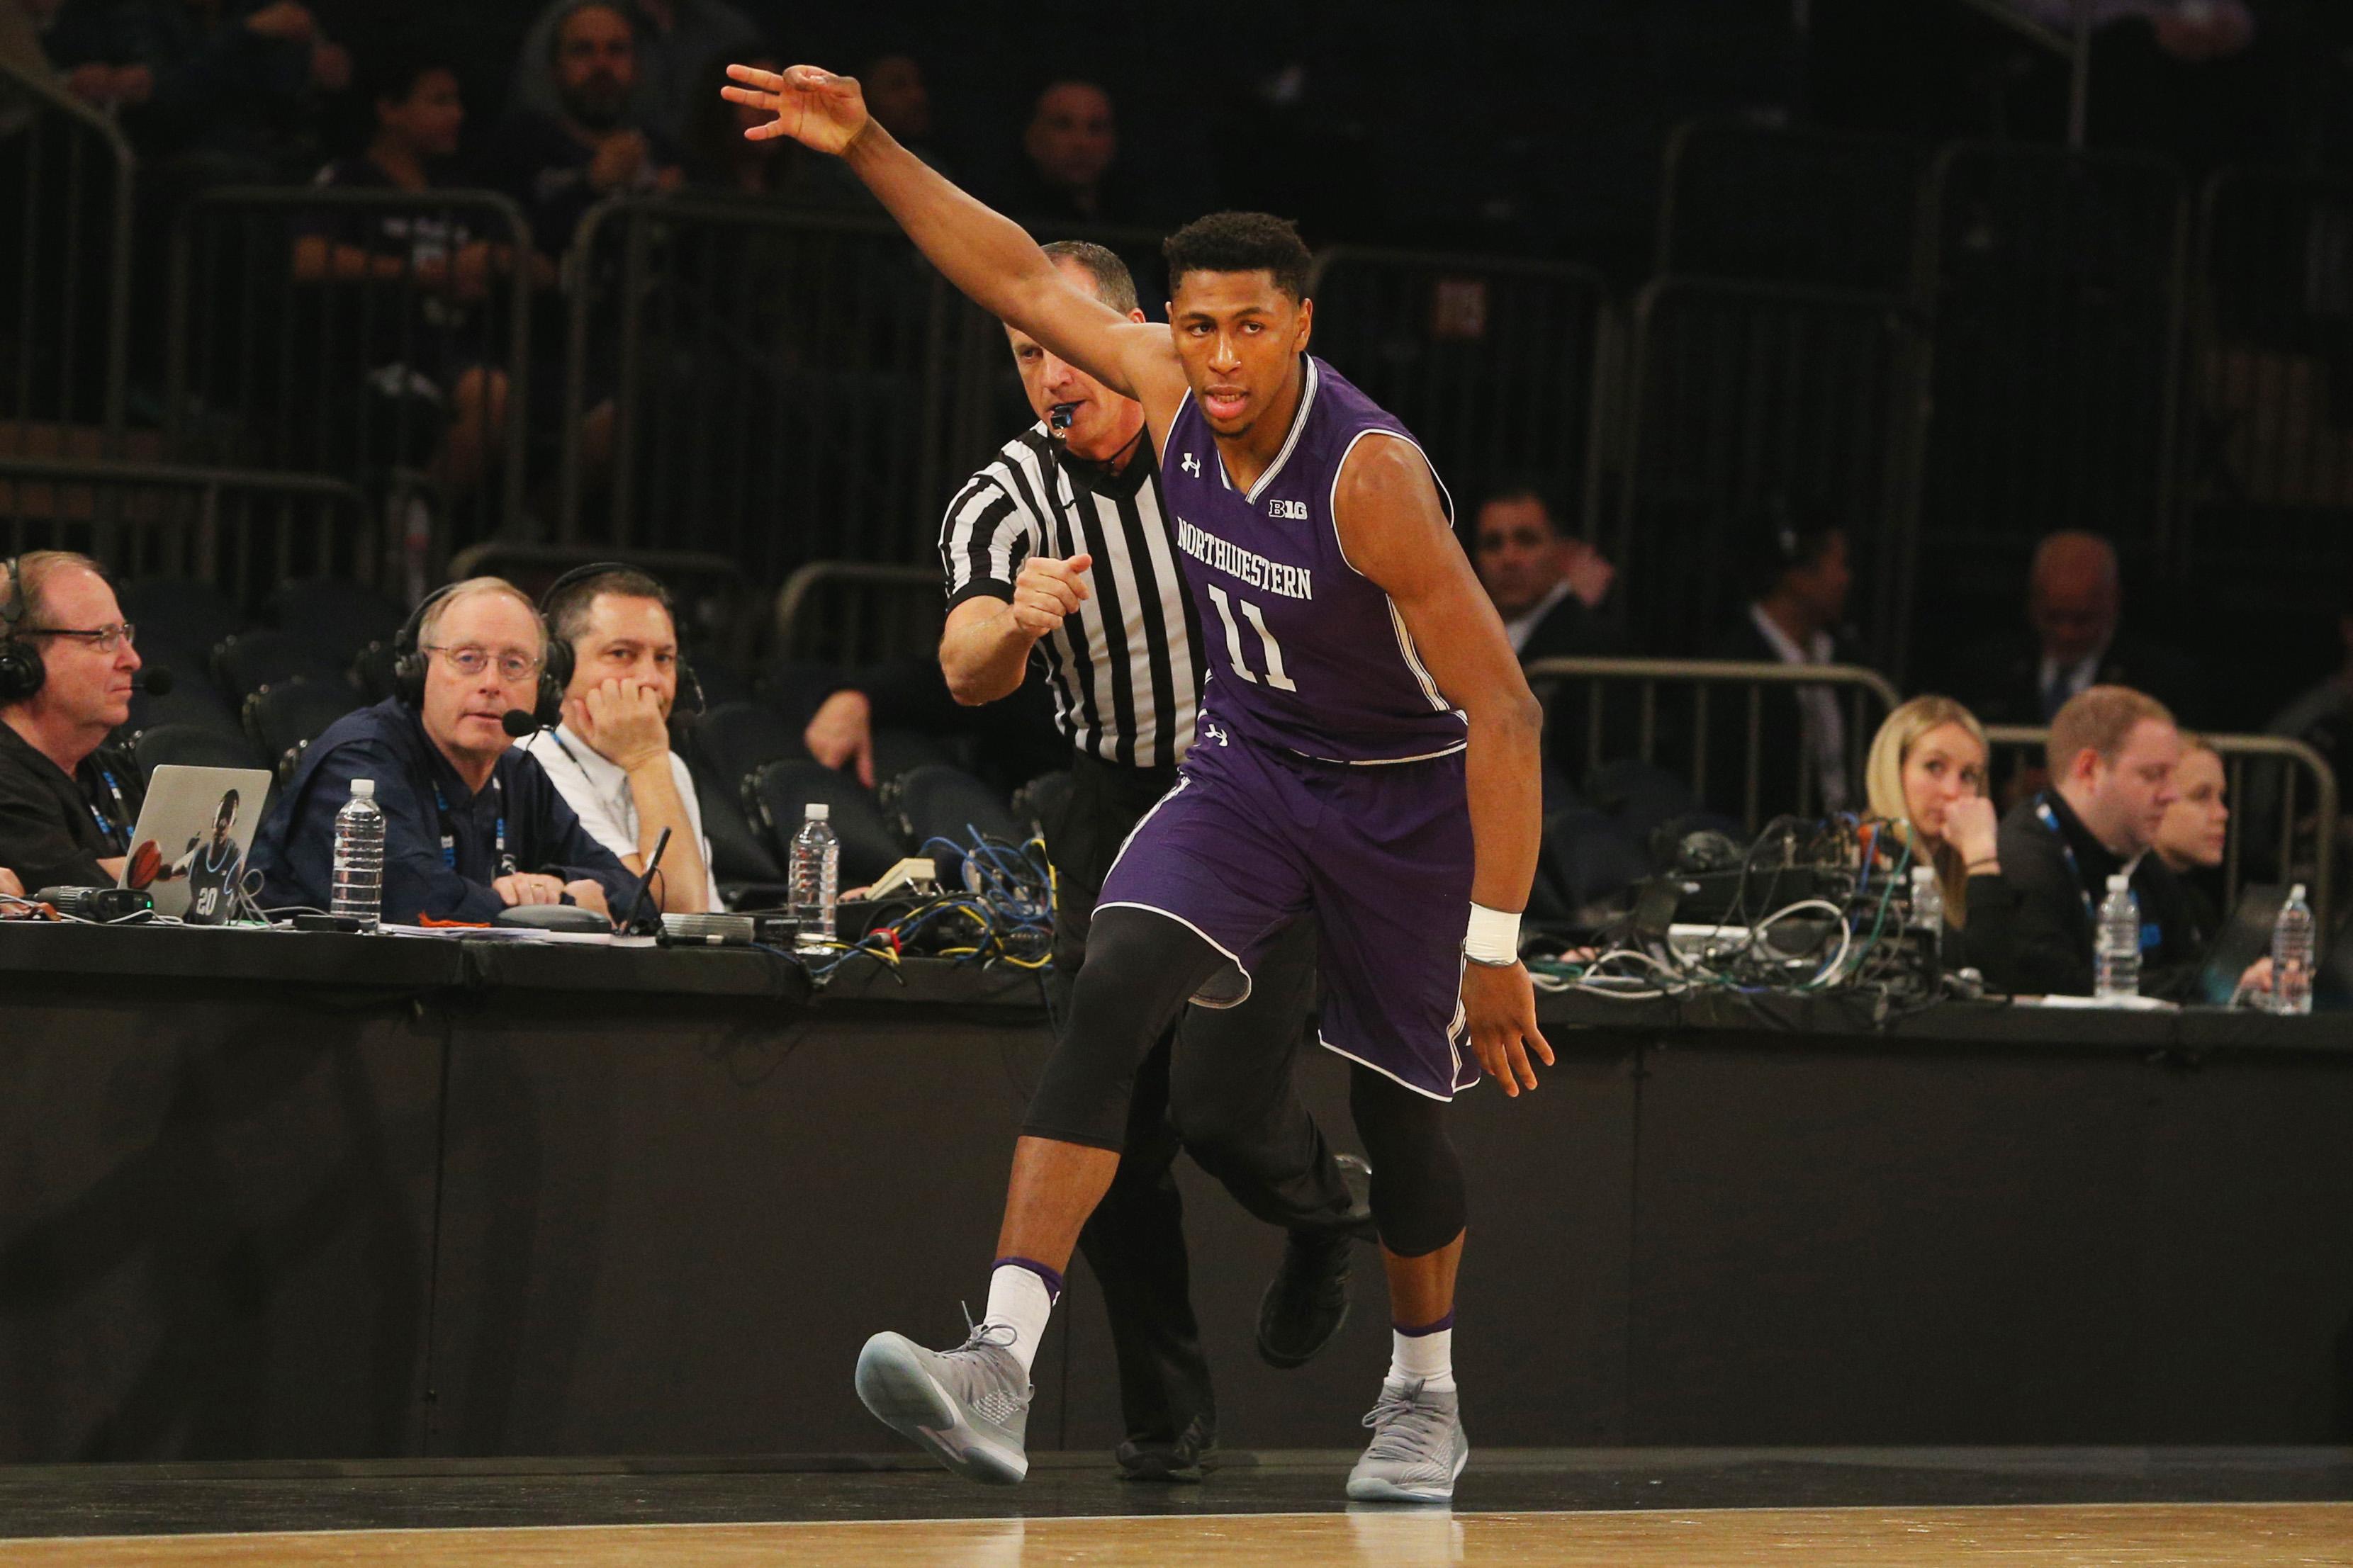 NCAA Basketball: Big Ten Conference Tournament-Penn State vs Northwestern